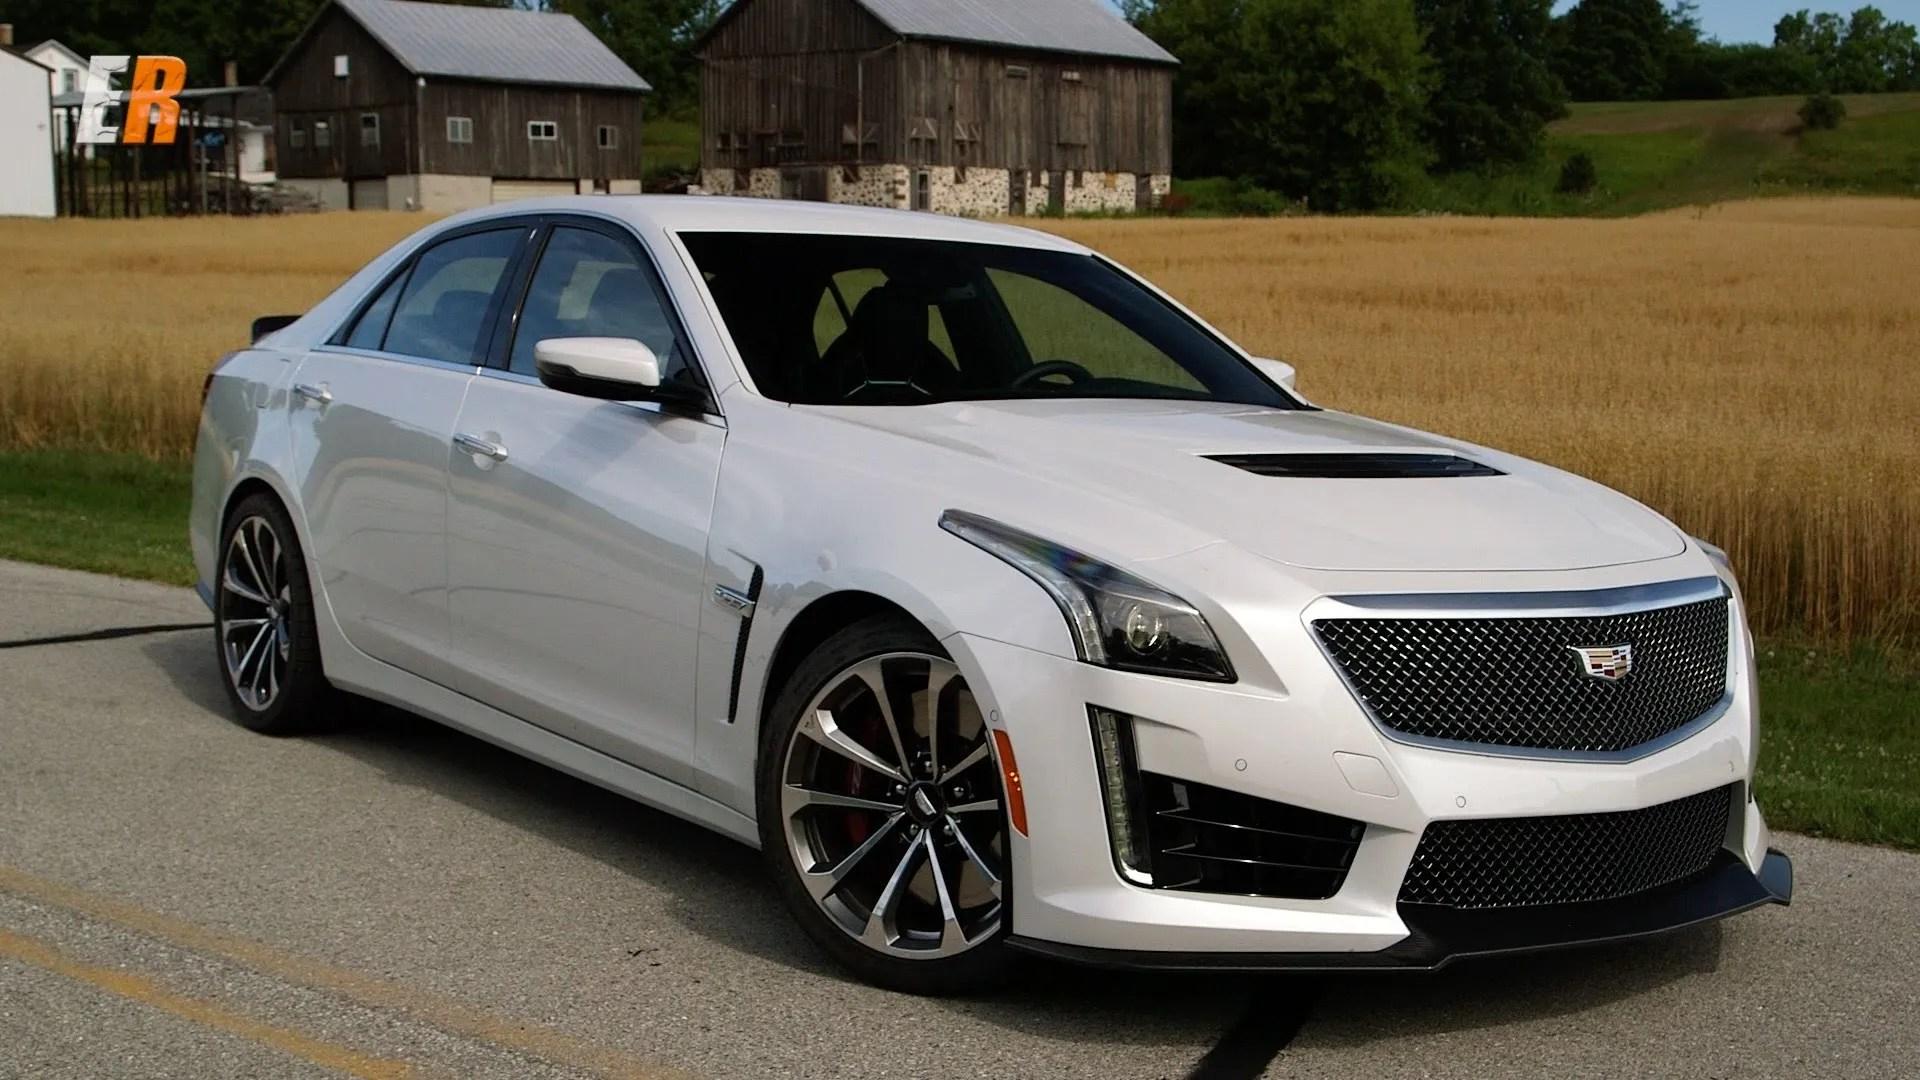 Cadillac CTS-V 2016 Exterior